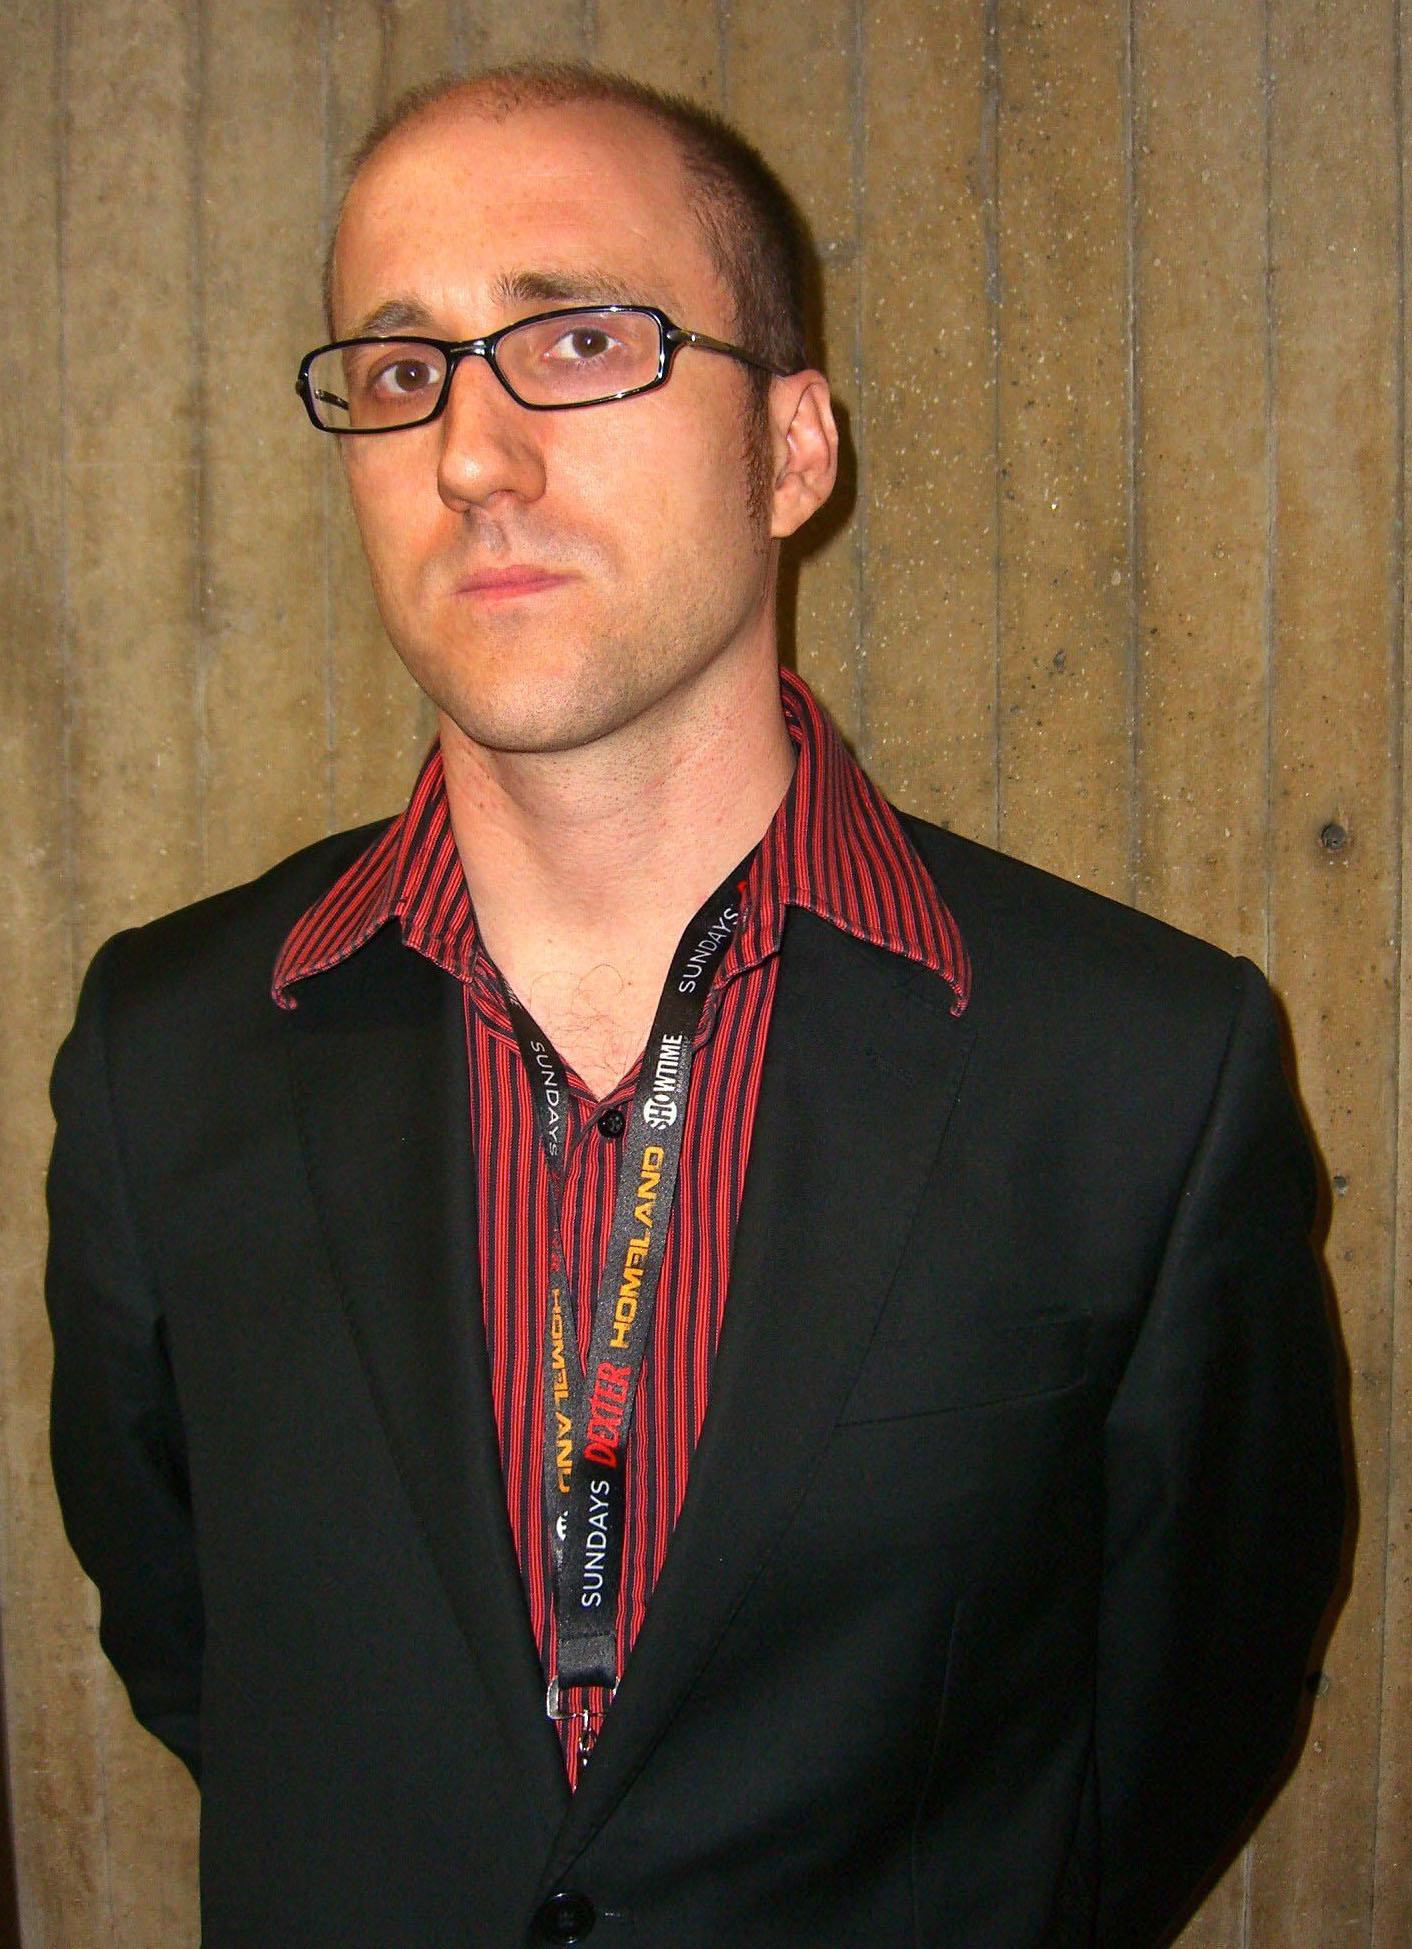 Gillen at the 2011 [[New York Comic Con]]